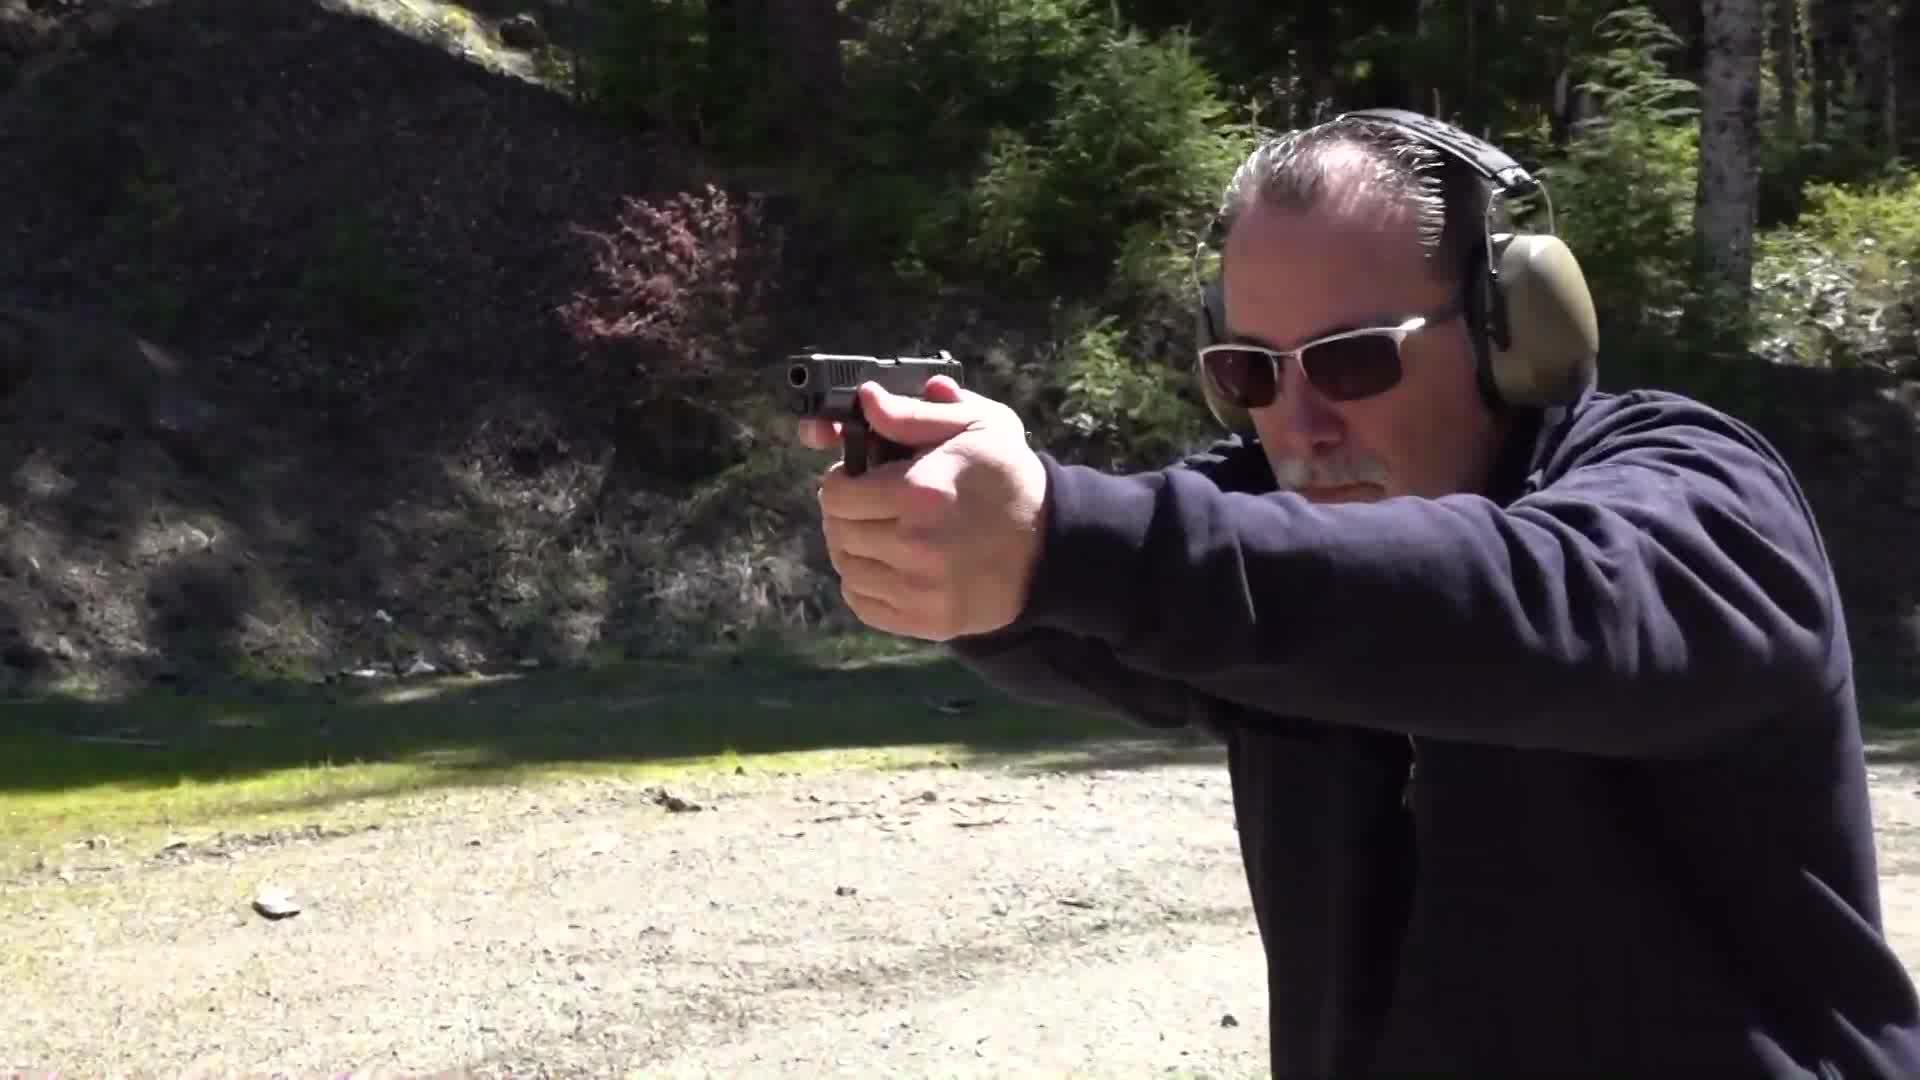 9mm口径半自动手枪,握在手上刚刚合适,户外靶场射击测试